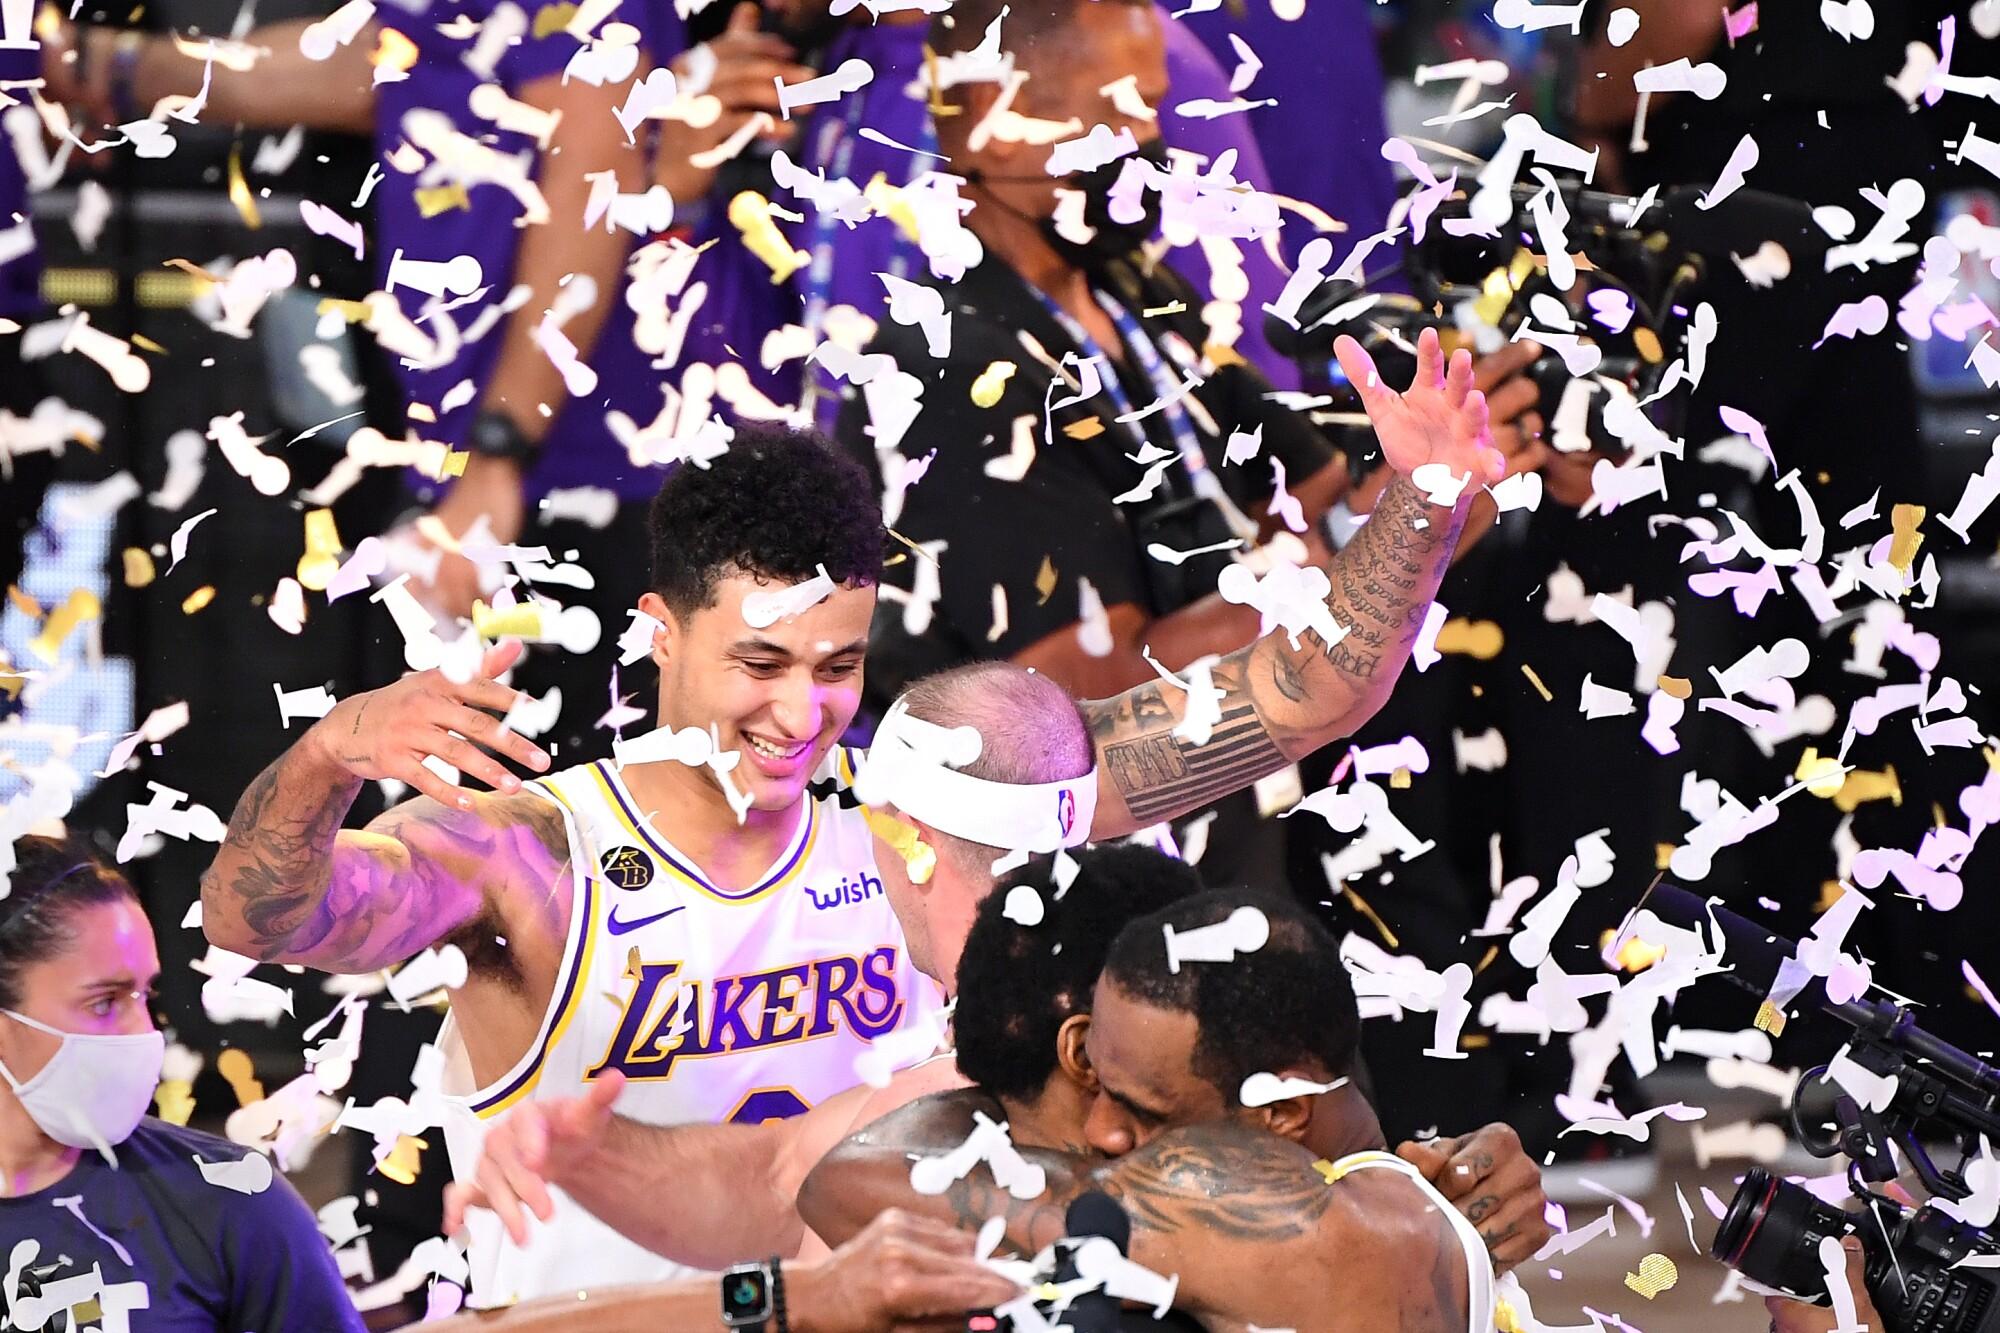 Kyle Kuzma and his Lakers teammates celebrate winning the 2020 NBA championship.